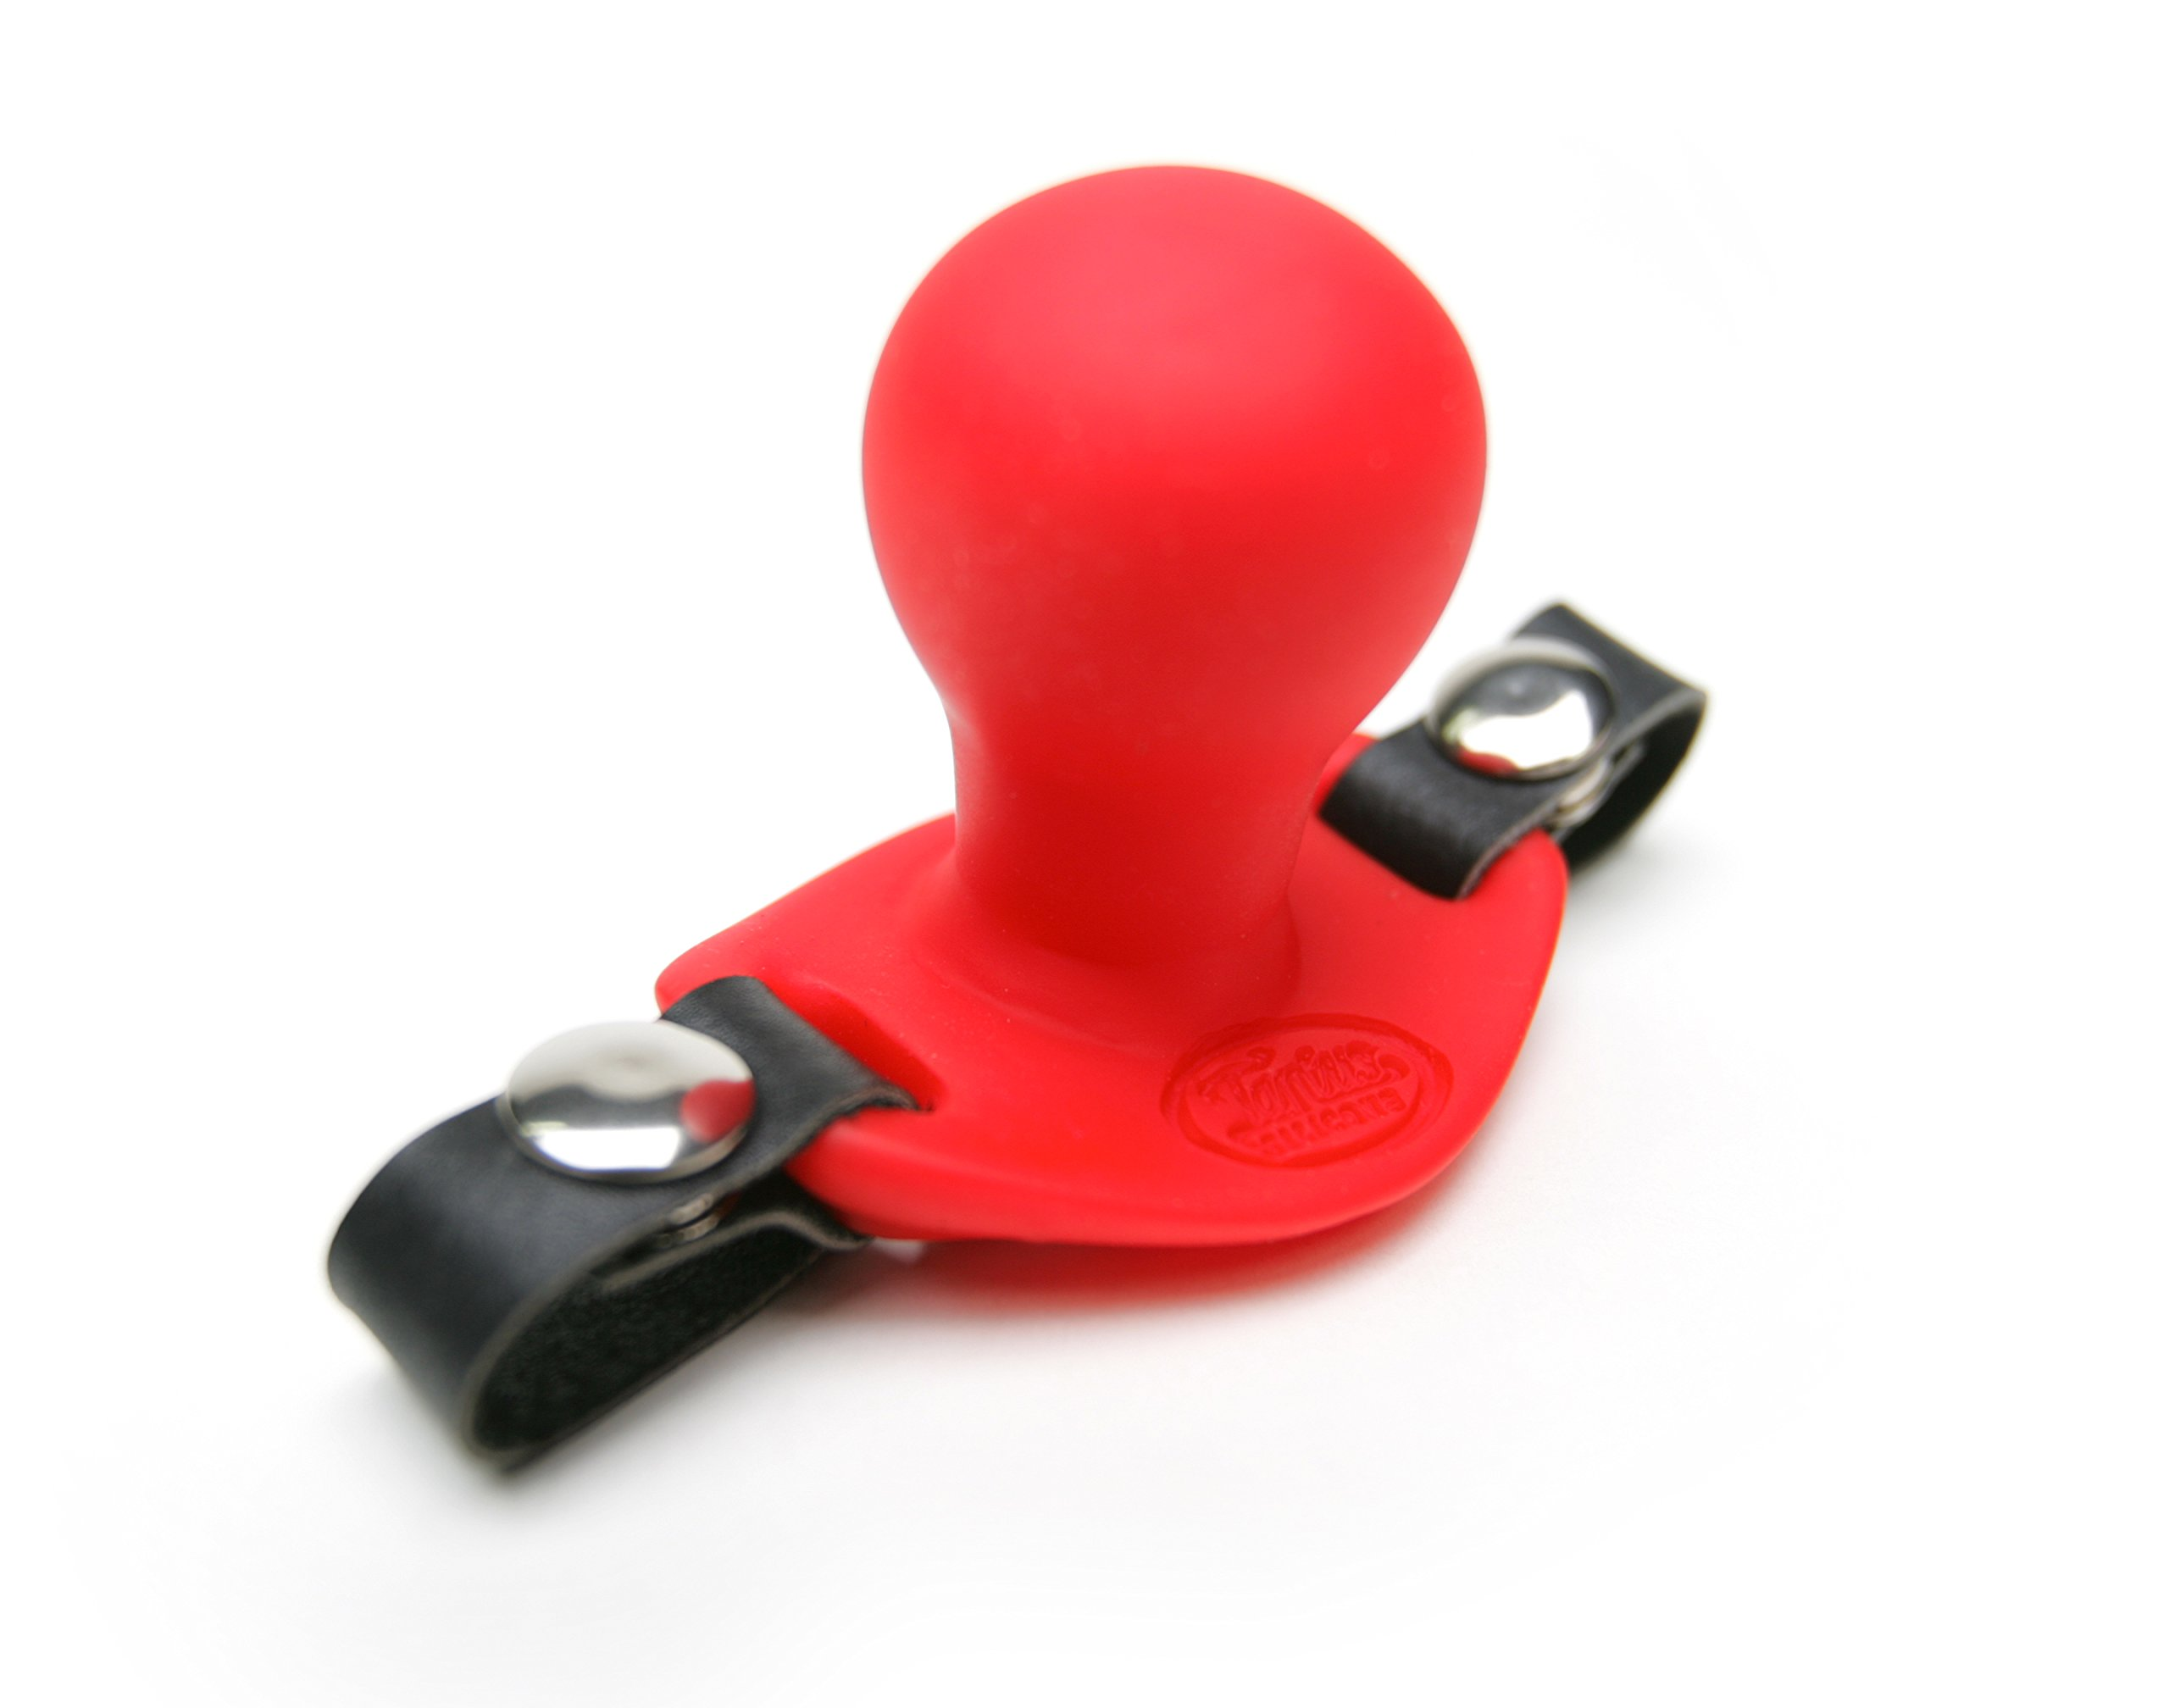 Tantus Beginner Ballgag - Ultra-Premium Silicone Gag - Red by Tantus